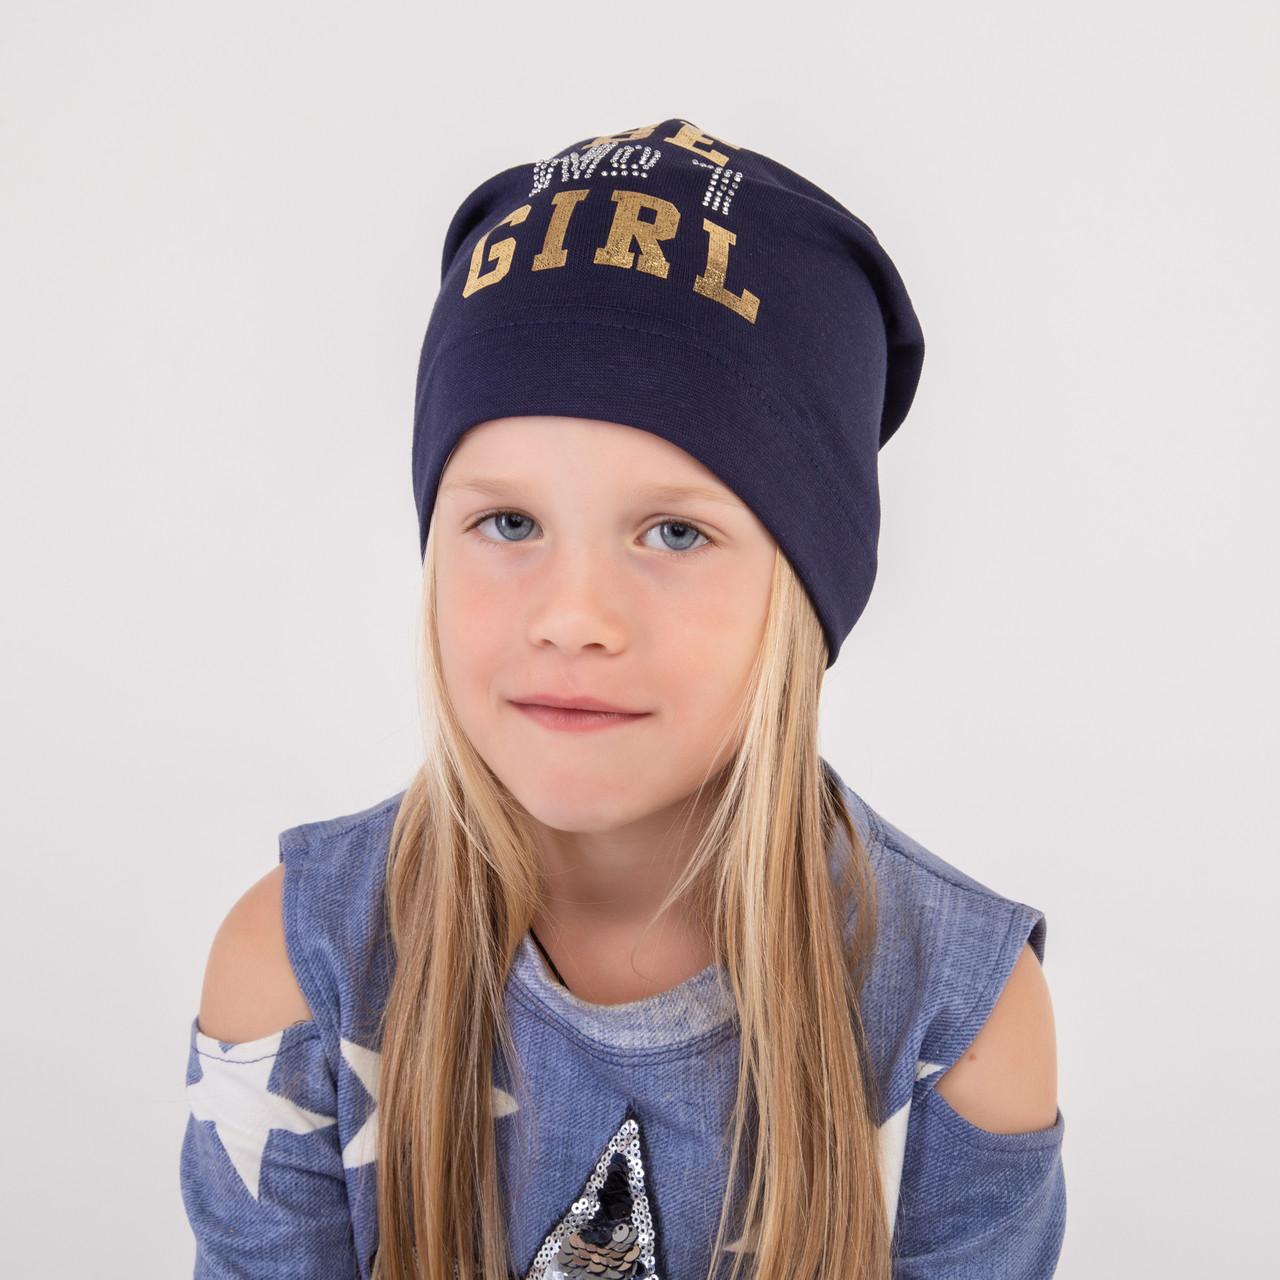 Хлопковая шапка на весну для девочки - Be #1 - Артикул 2274